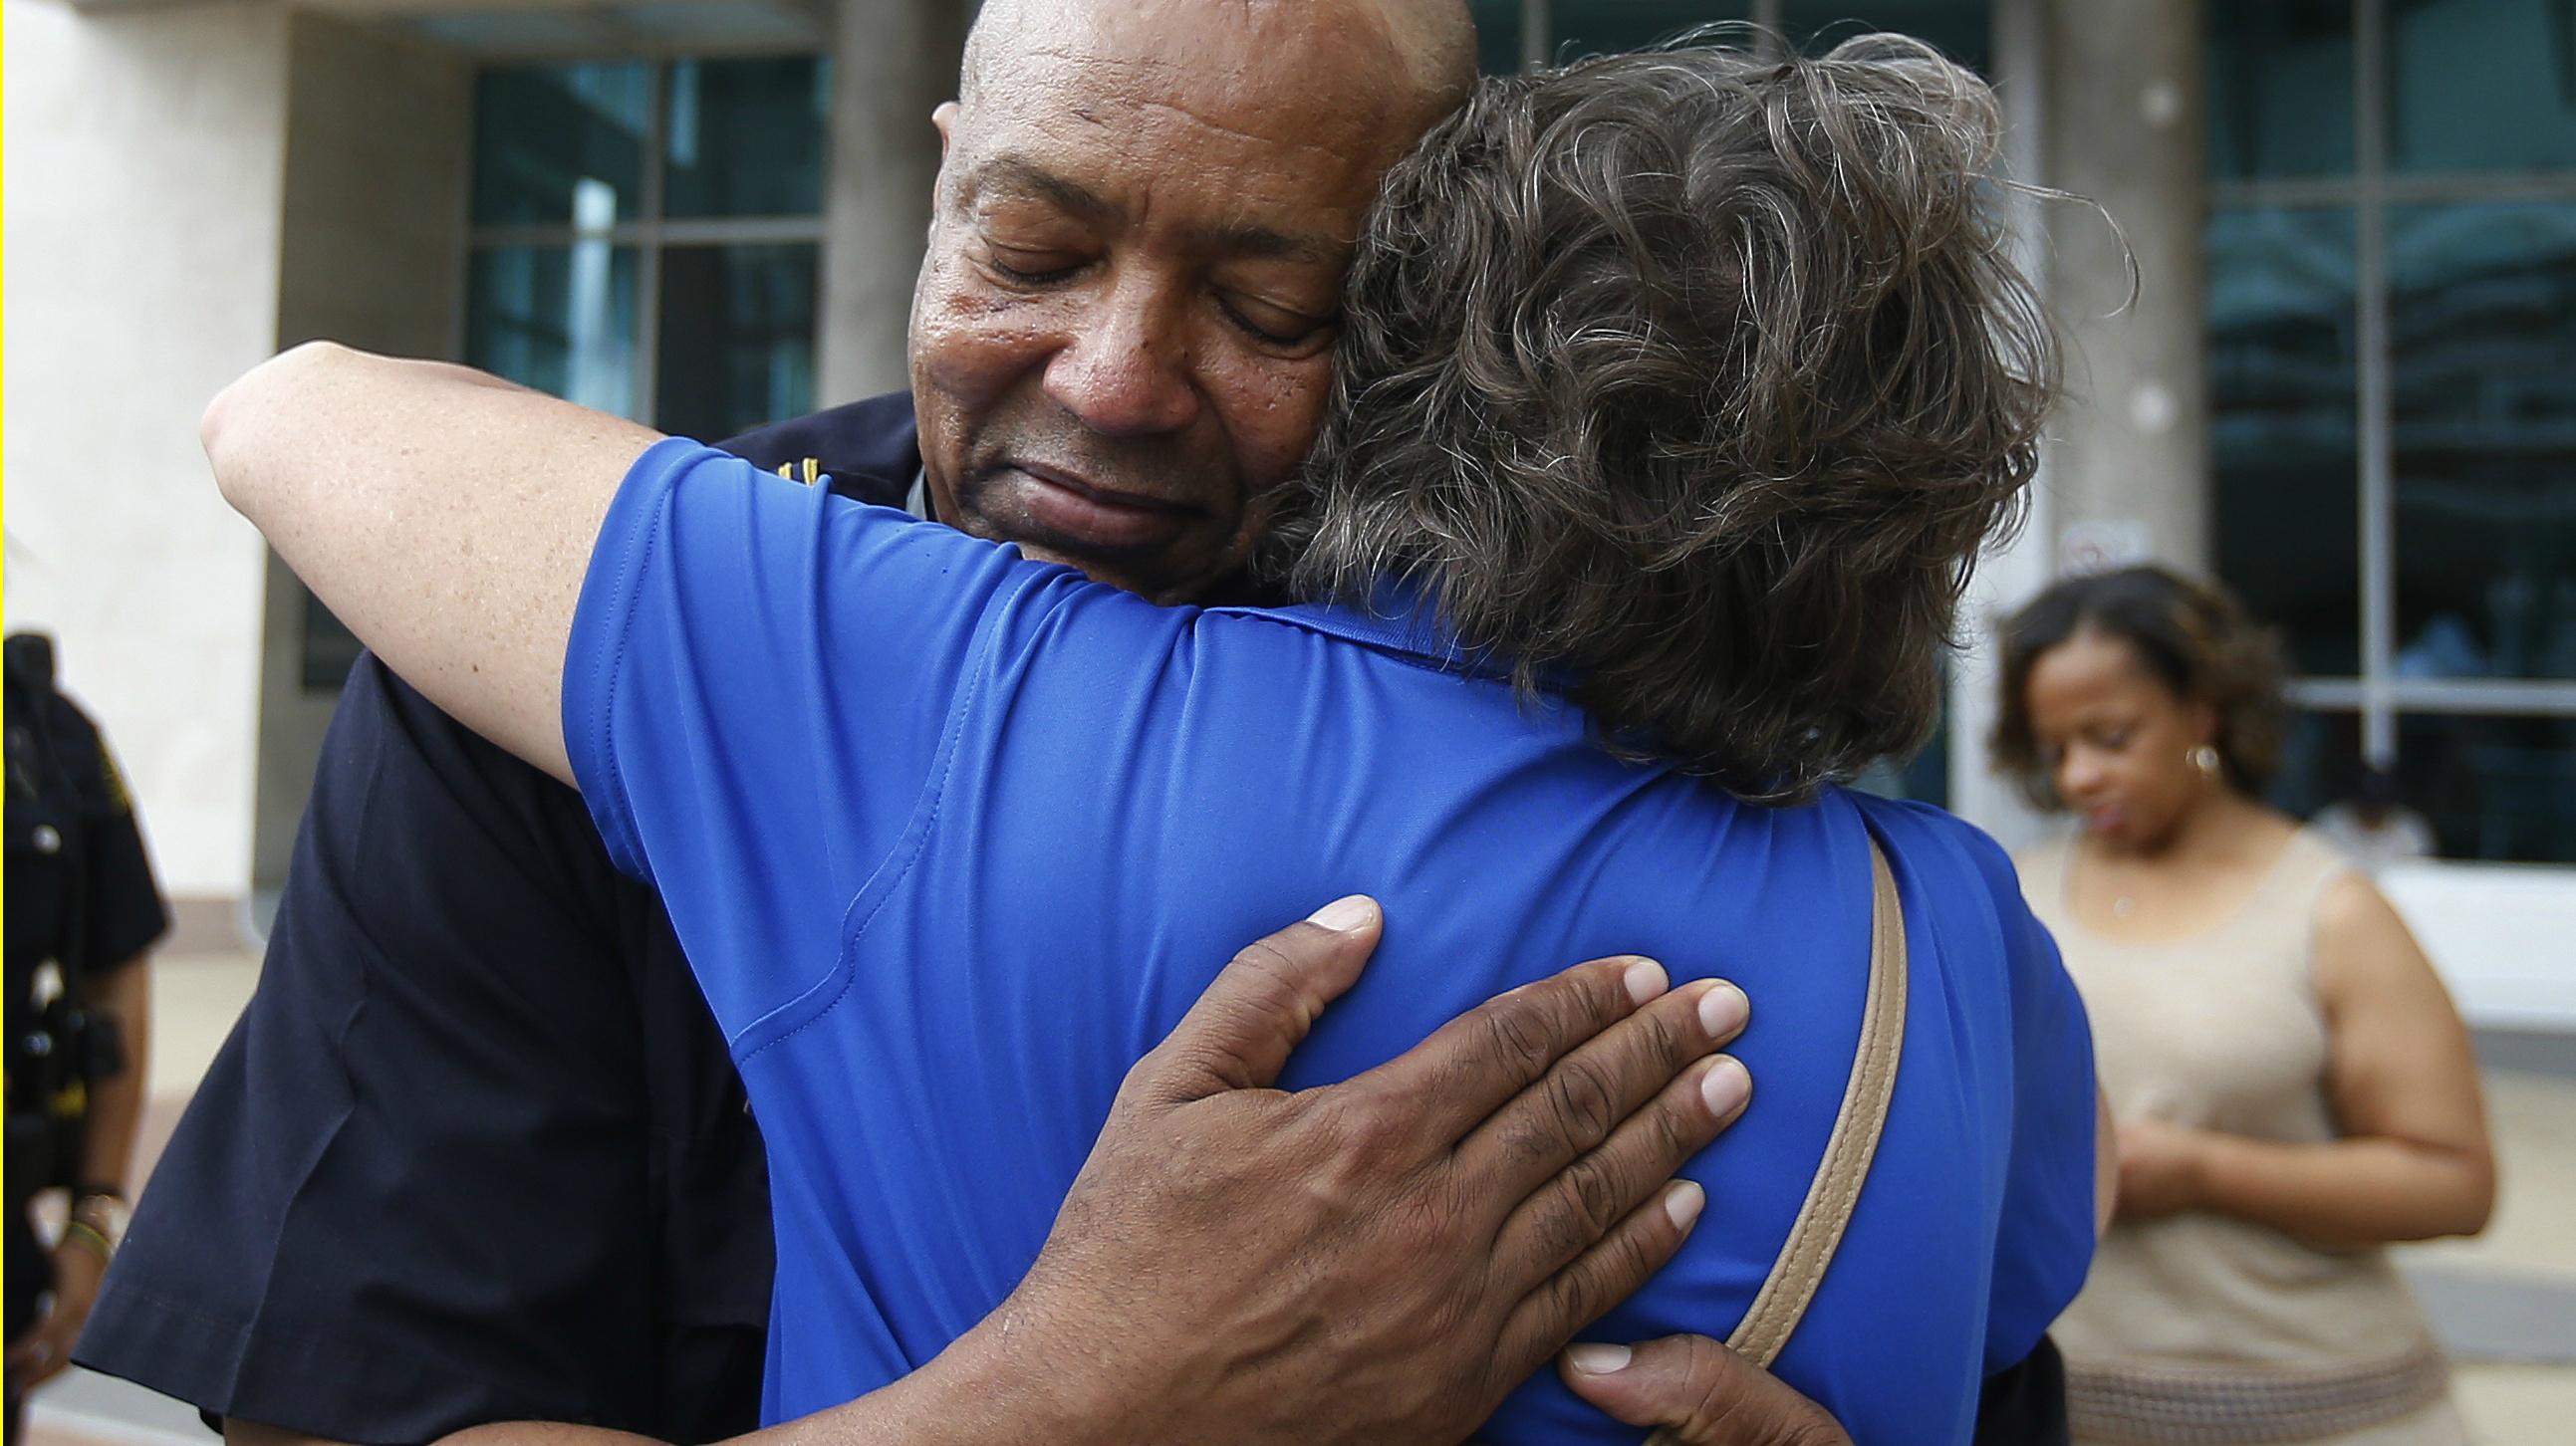 dallas, police, hug, black lives matter